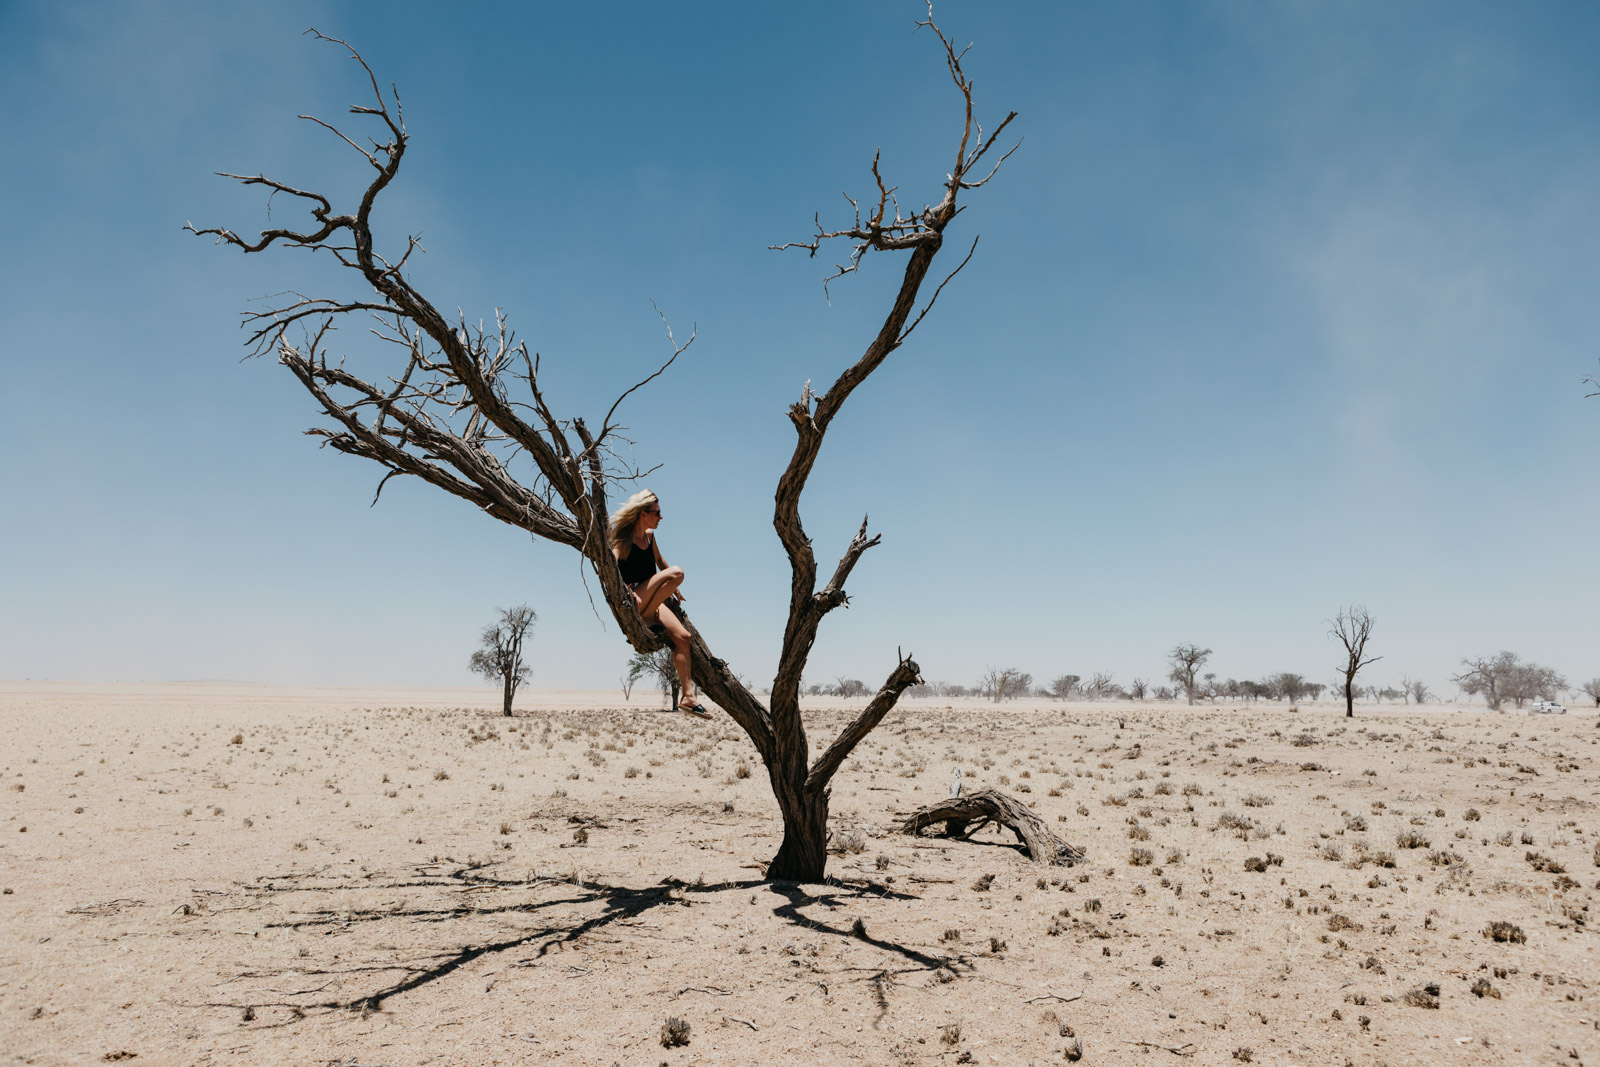 namibia_trip_rooftent_camping_roadtrip (10 von 10).jpg